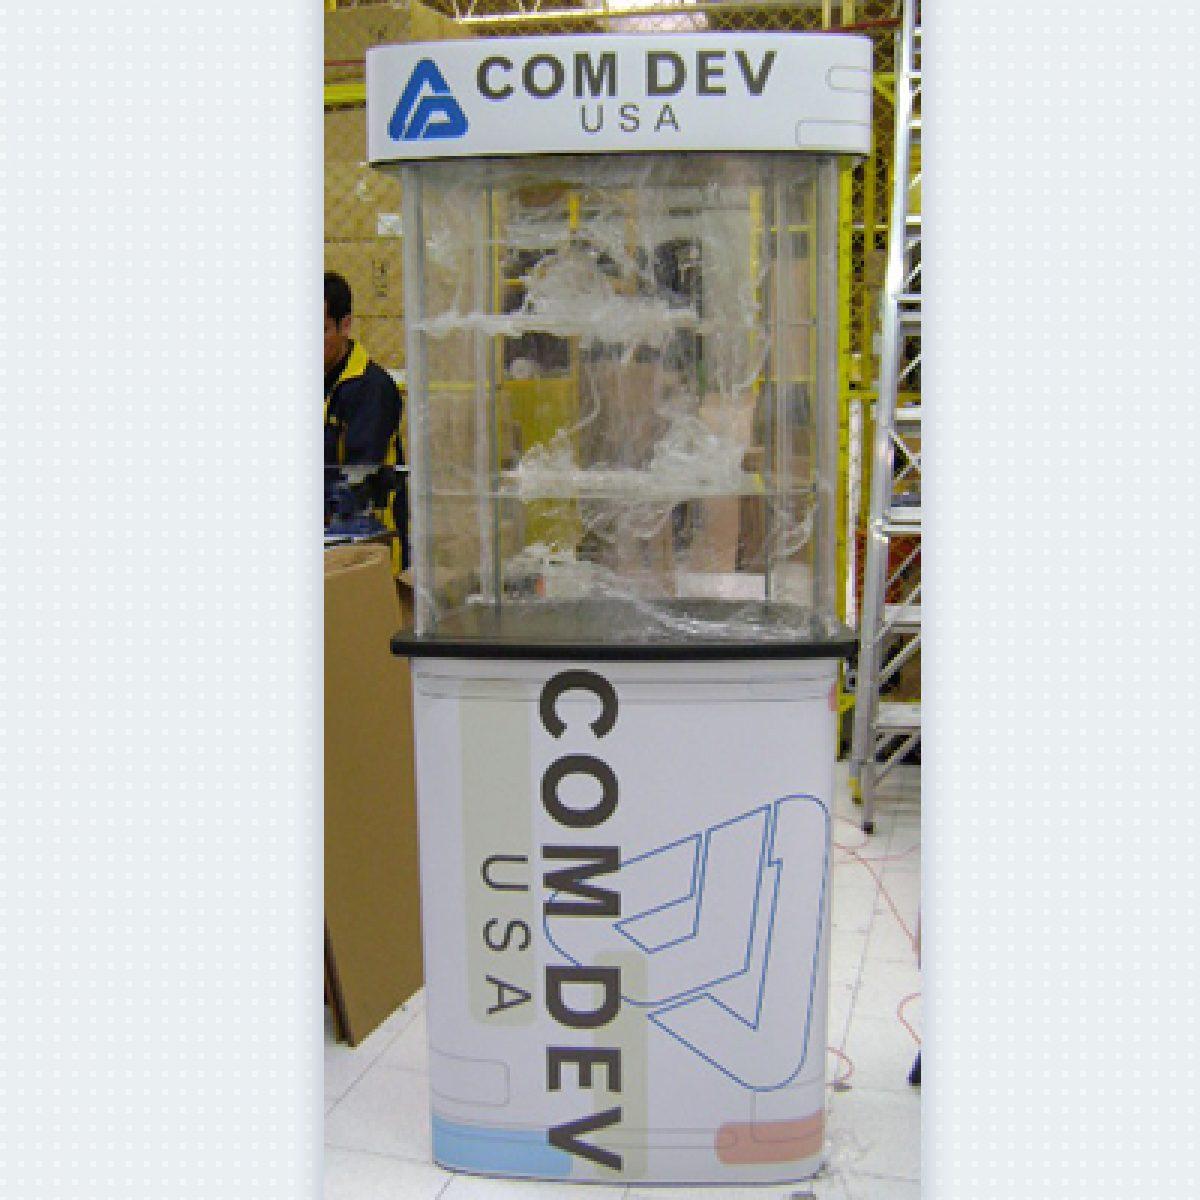 20) Counters & Kiosks